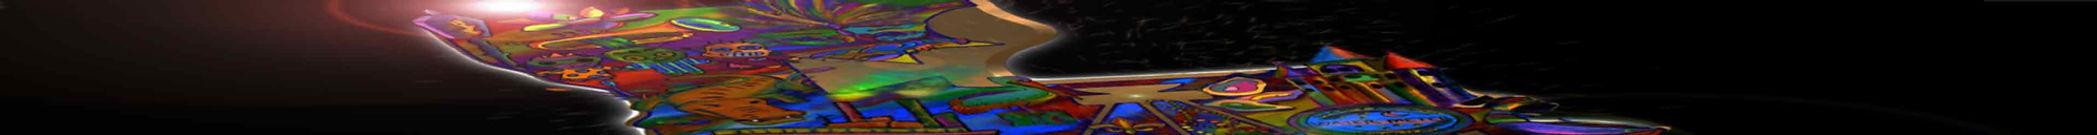 AFX-WEB-ANIHEAD2.jpg